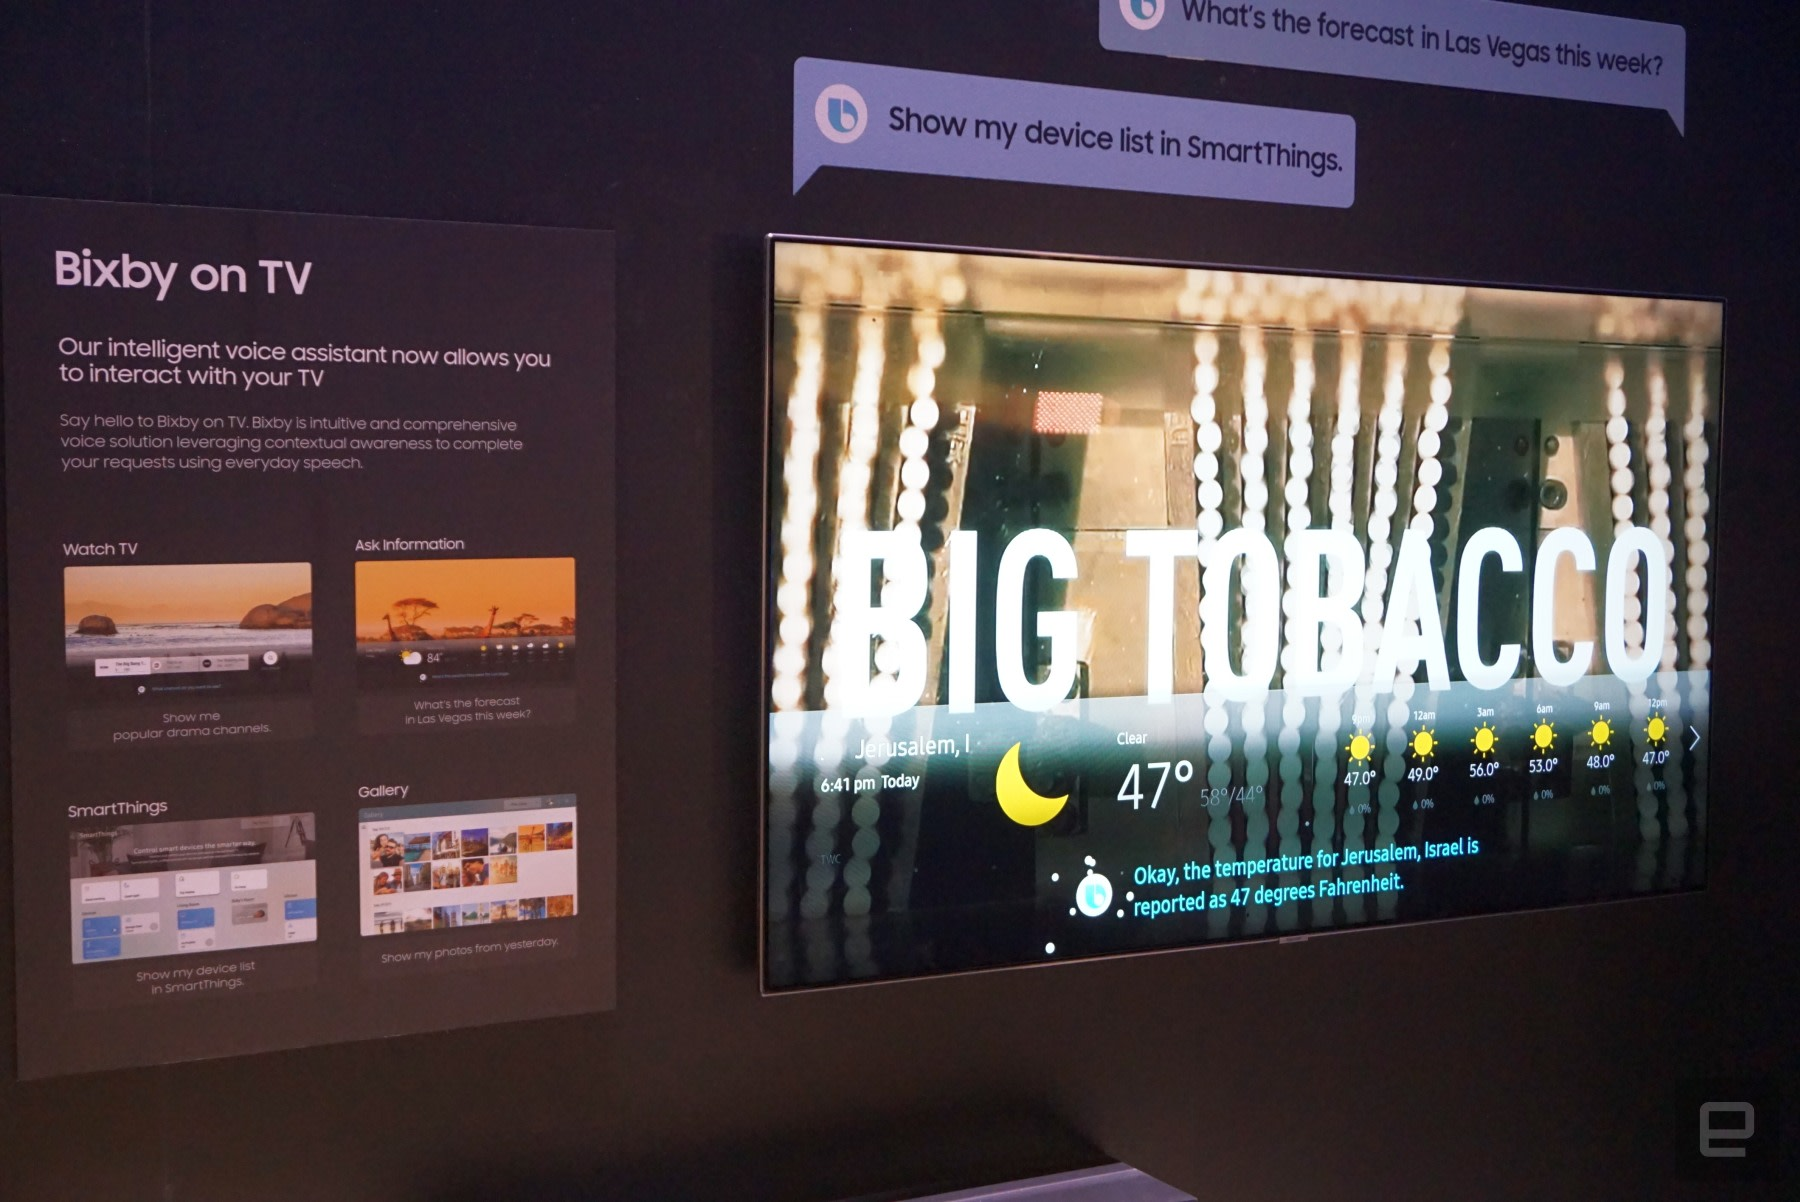 samsung 39 s 2018 4k tvs add bixby ai. Black Bedroom Furniture Sets. Home Design Ideas